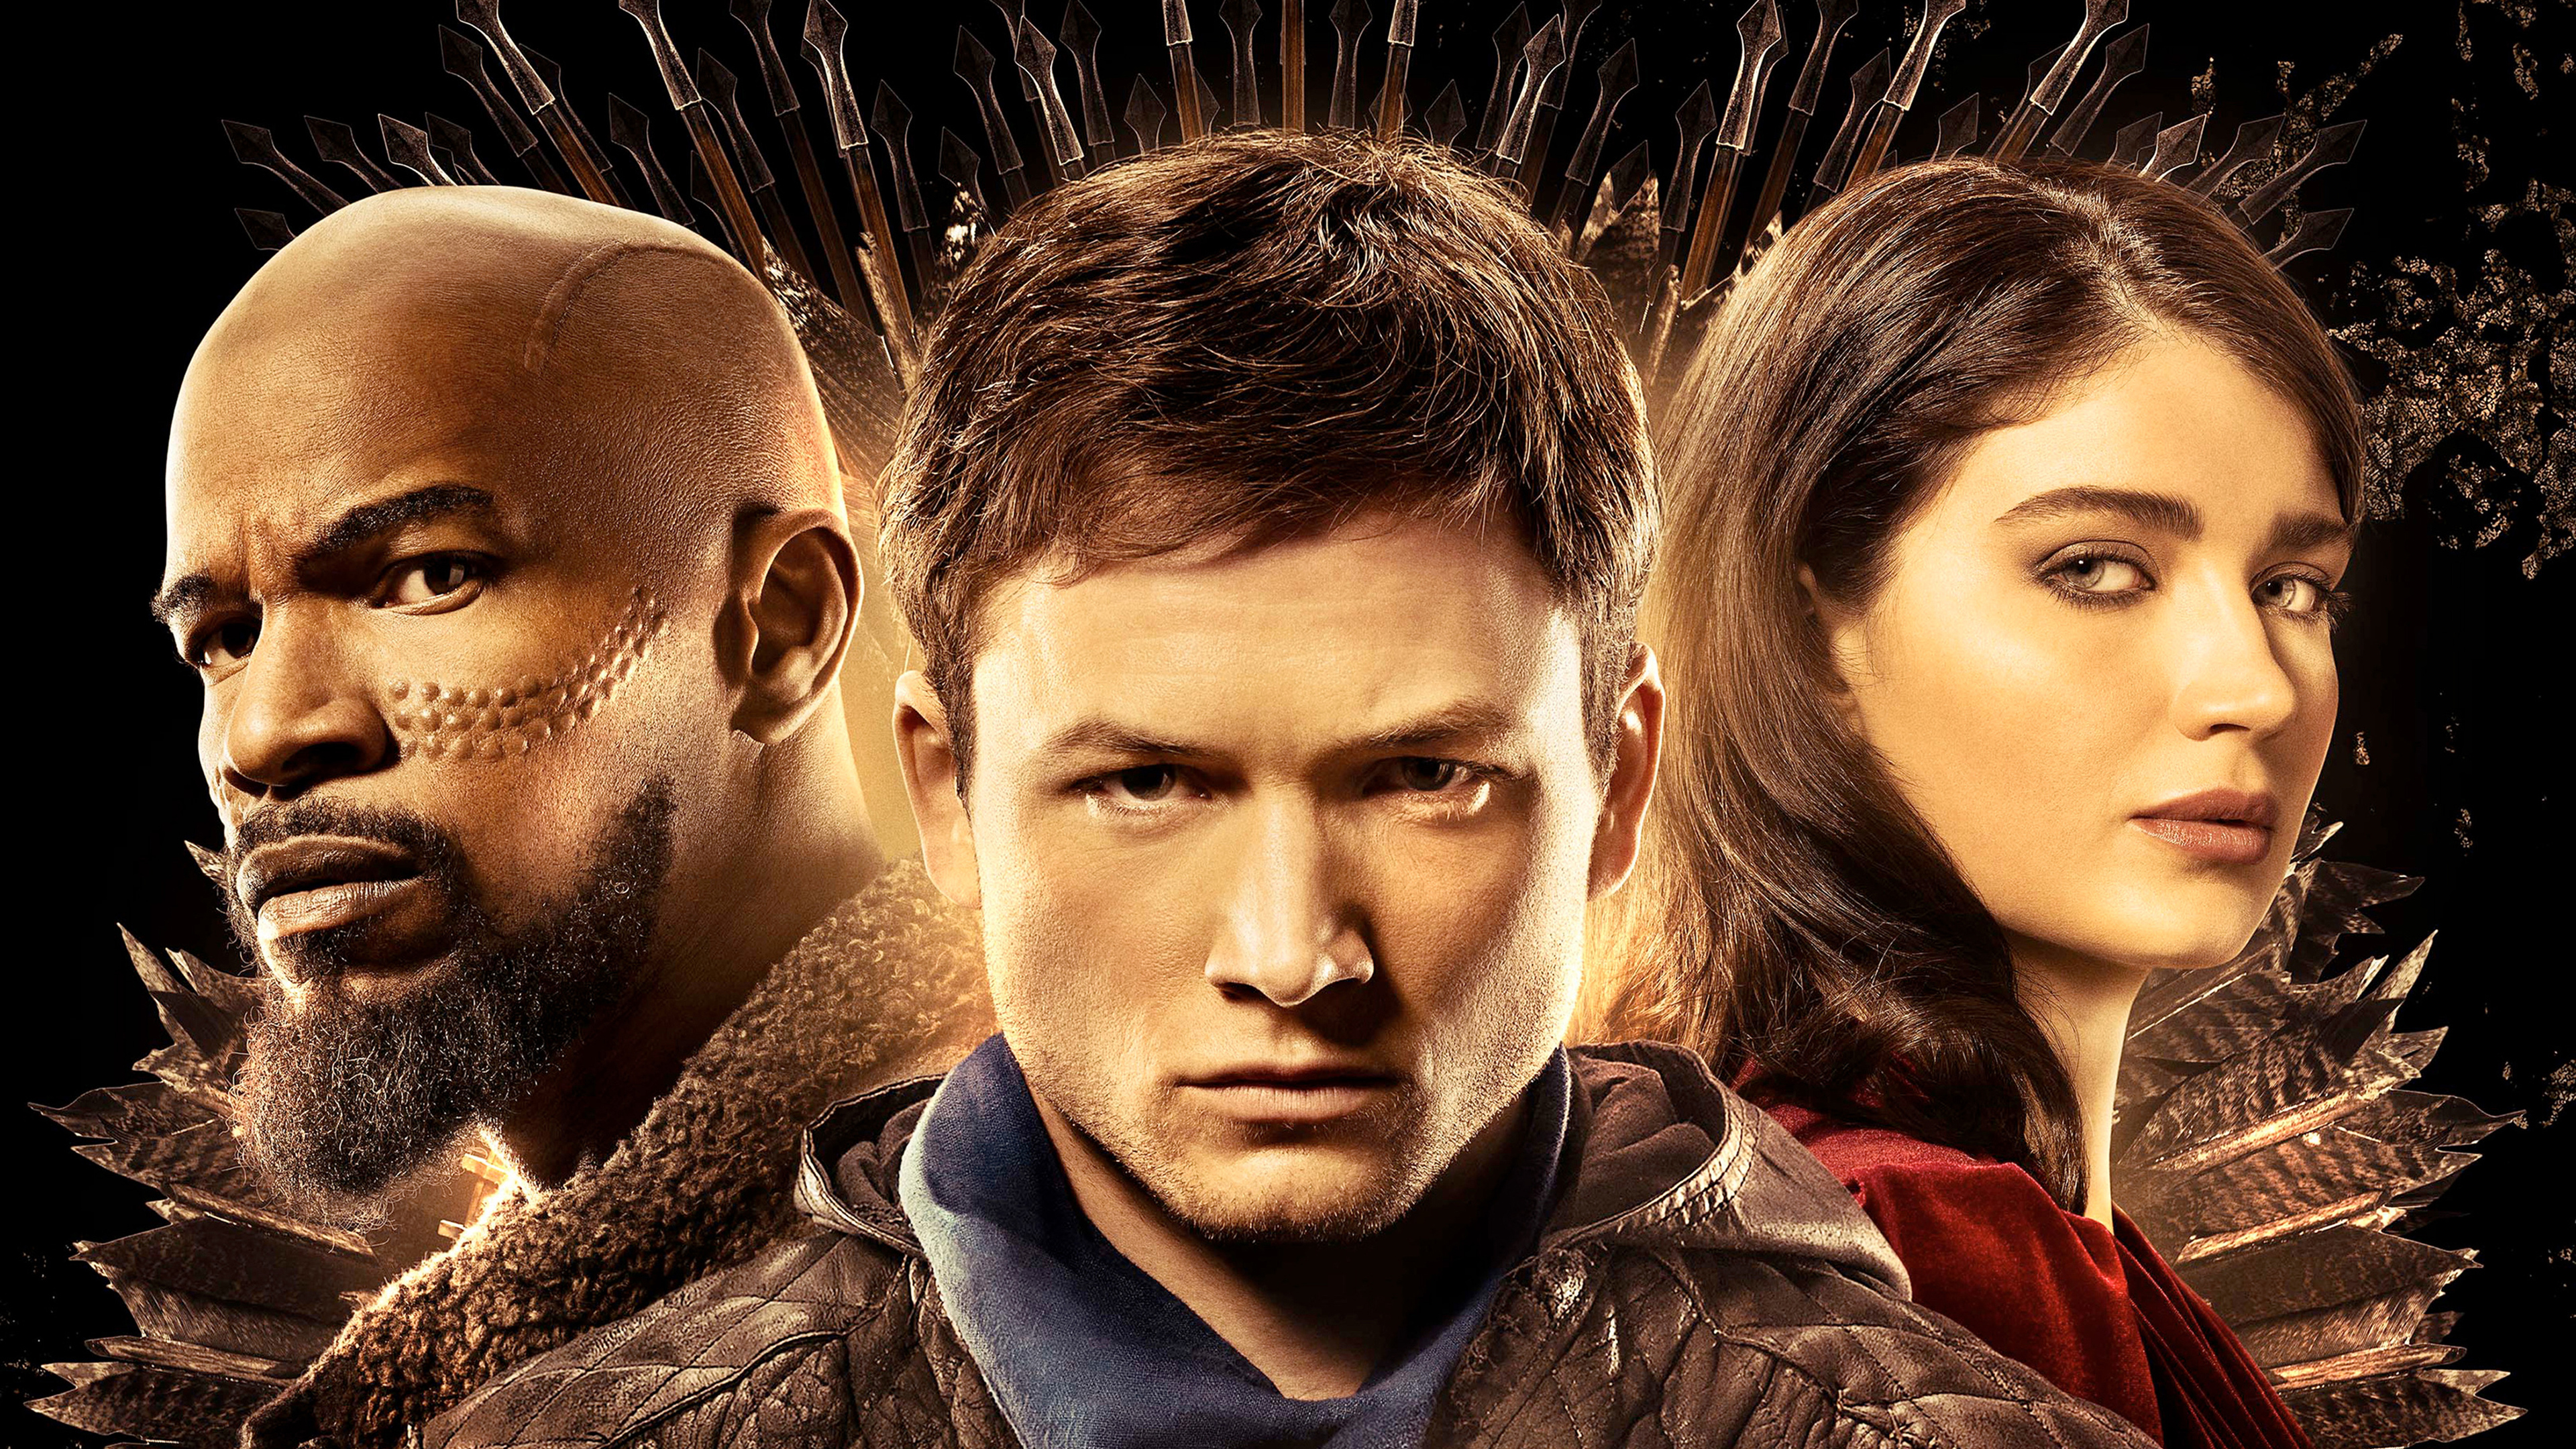 Wallpaper 4k Robin Hood Movie 4k 2018 Movies Wallpapers 4k